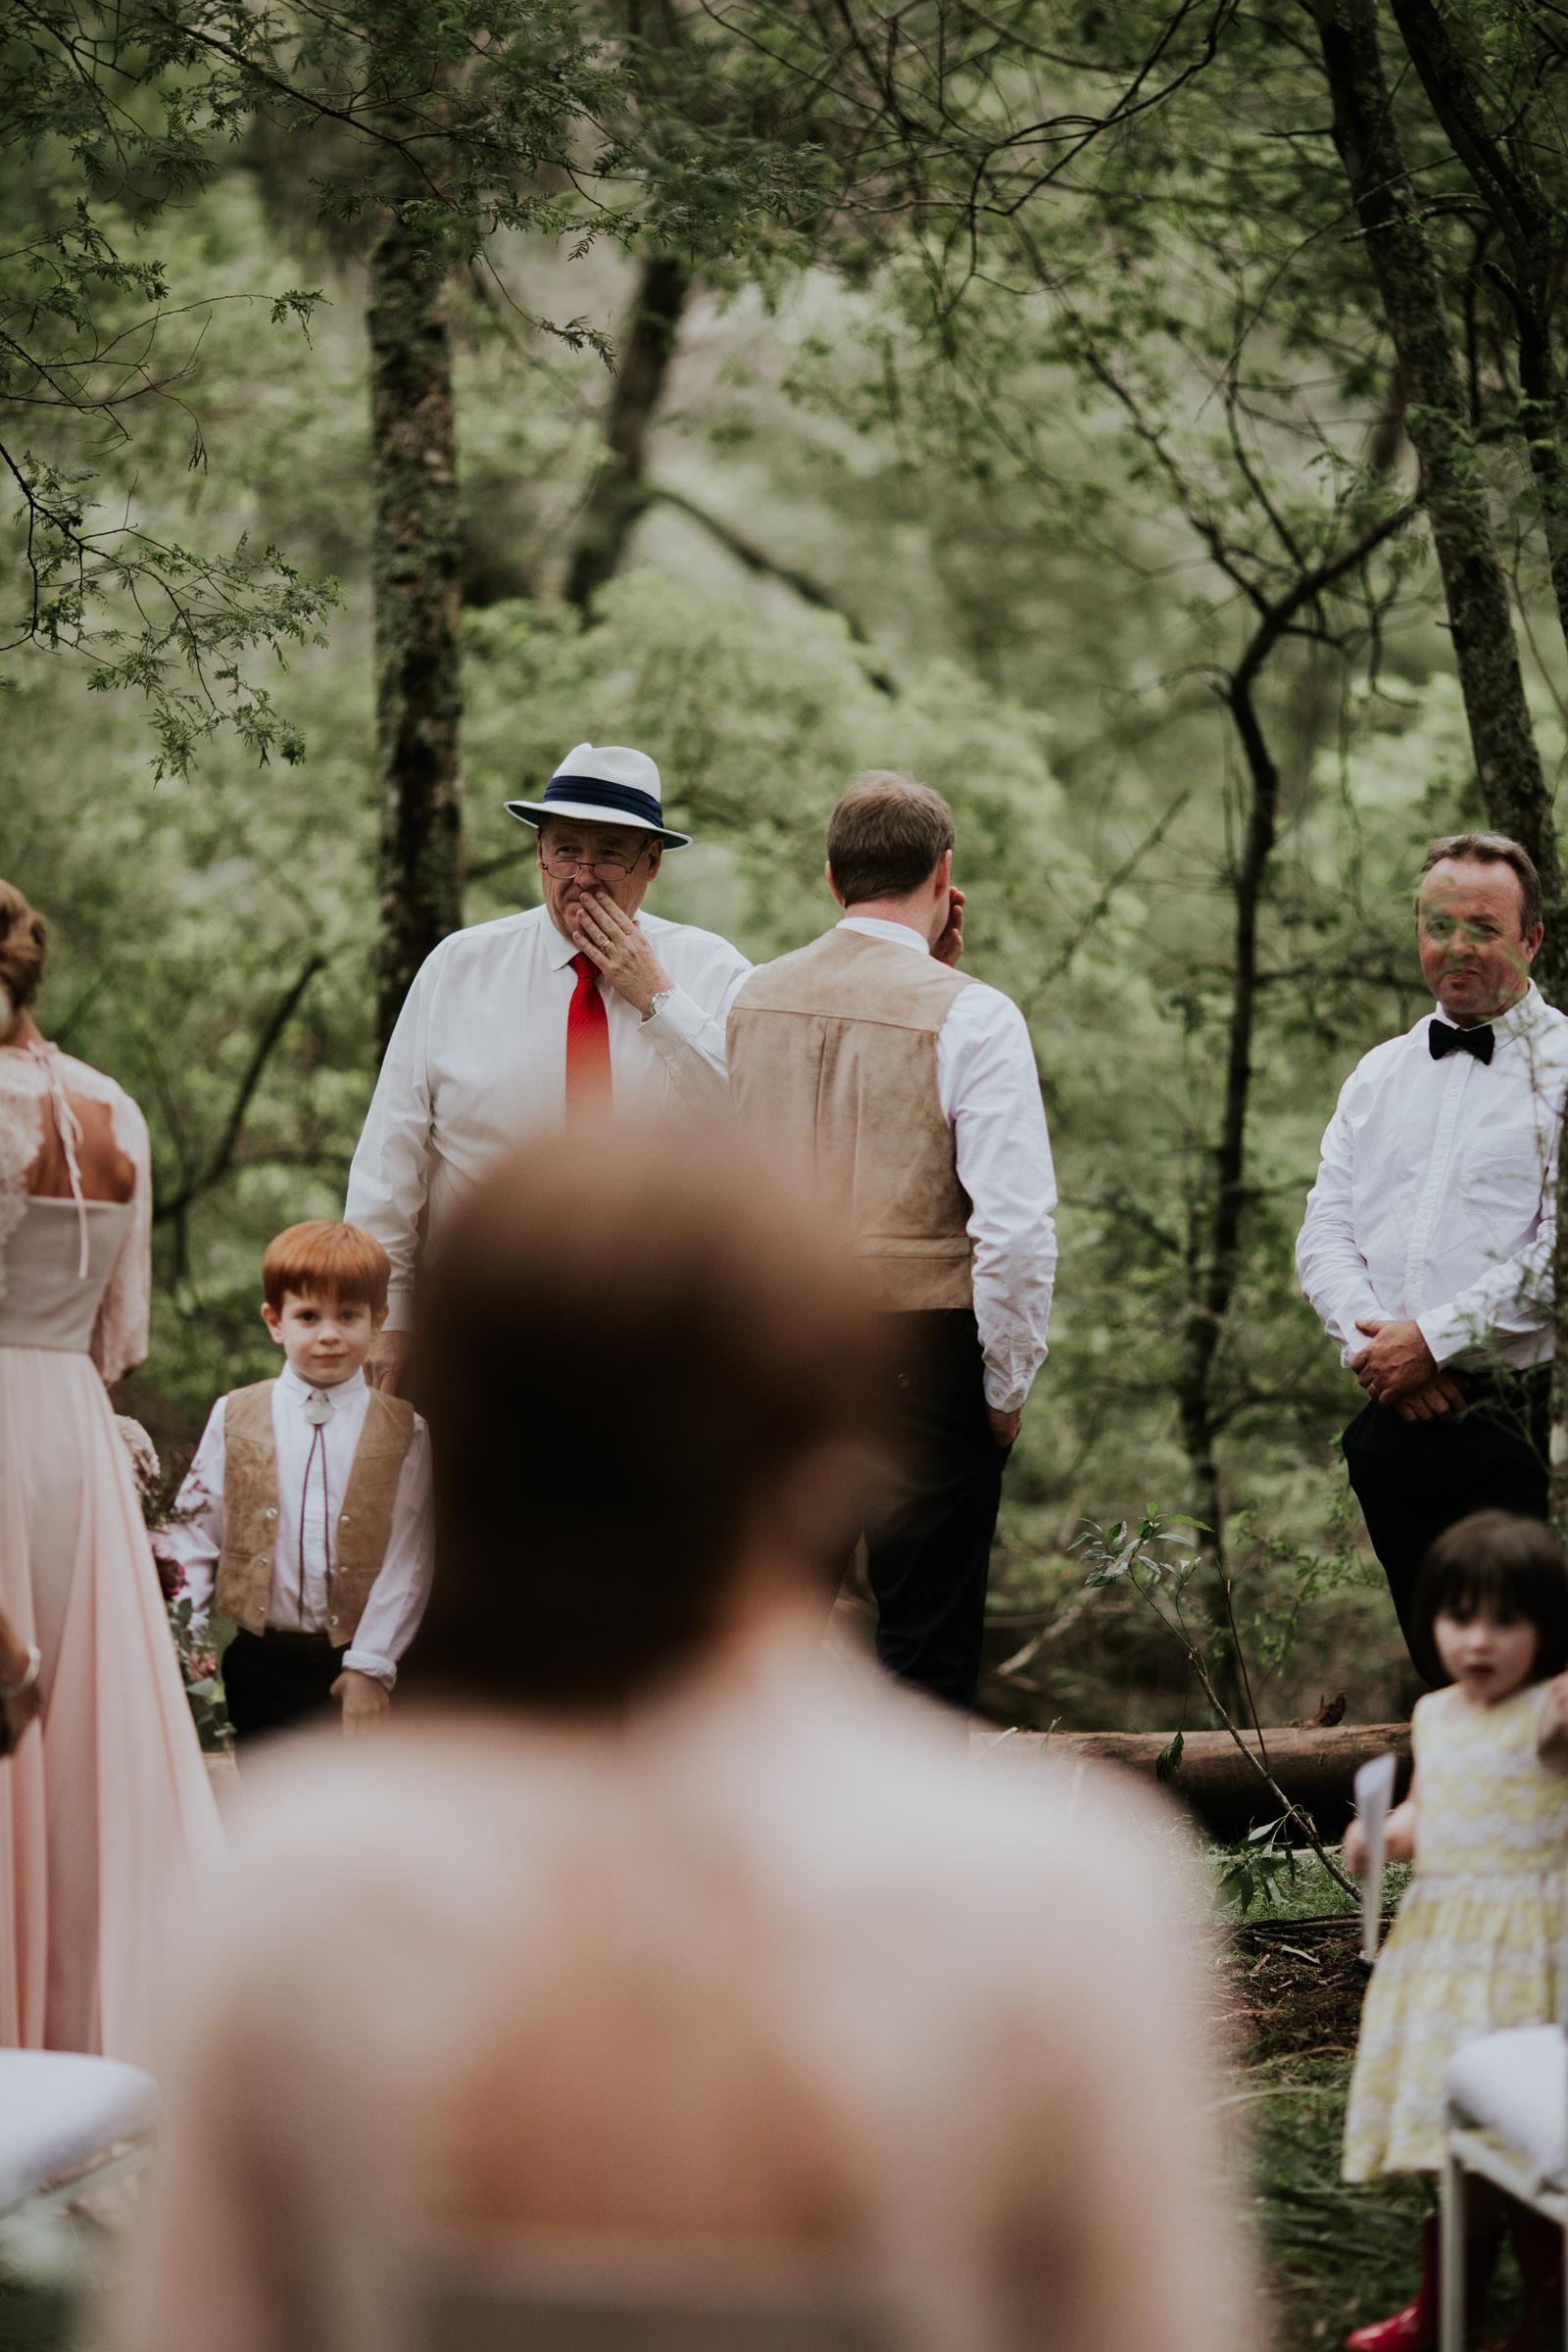 Emma+John+Far+South+Coast+Wedding+Festivl+Glamping+Bush-92.jpg